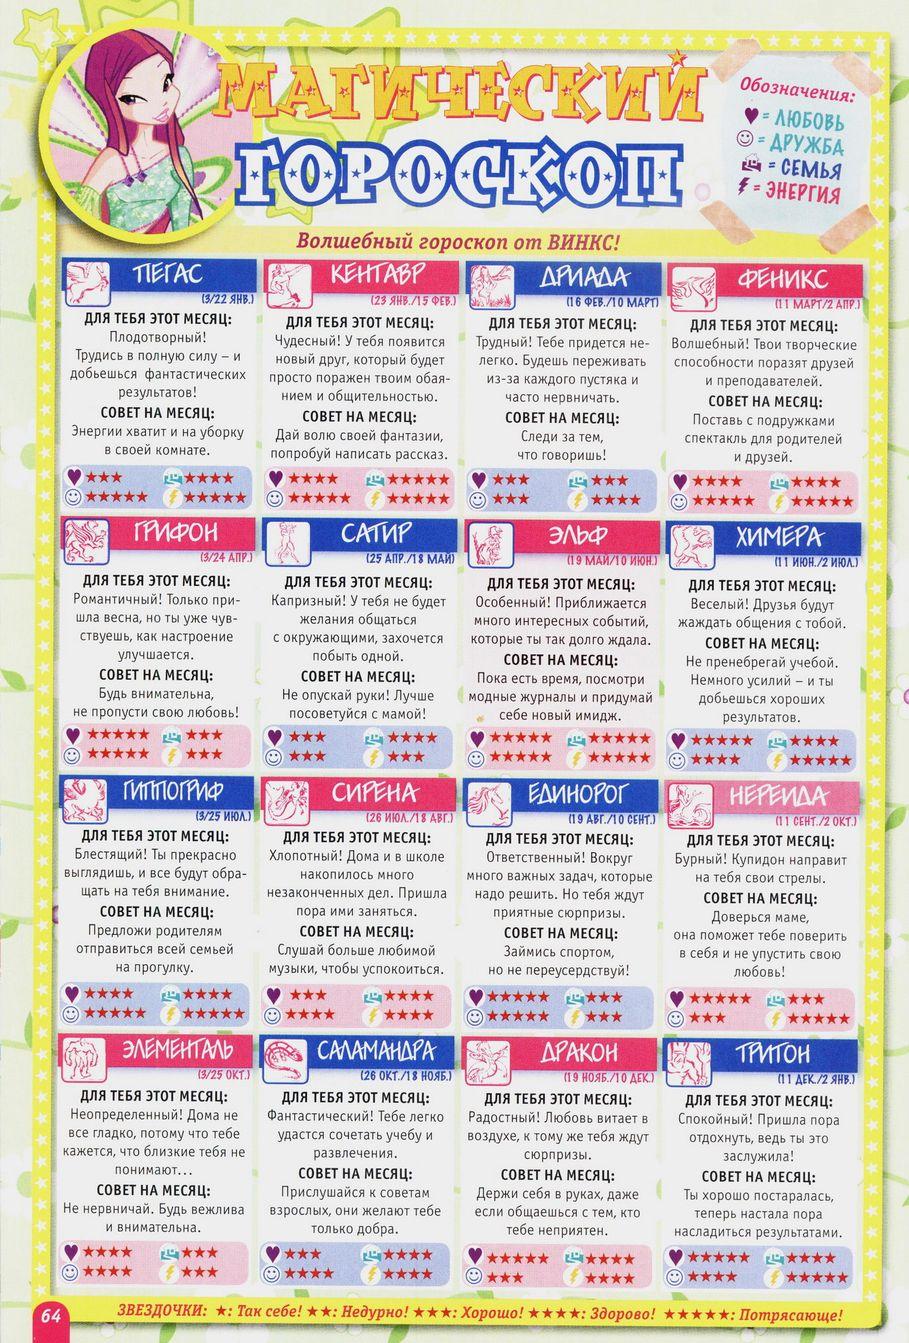 Комикс Винкс Winx - Неверное решение (Журнал Винкс №3 2011) - стр. 64